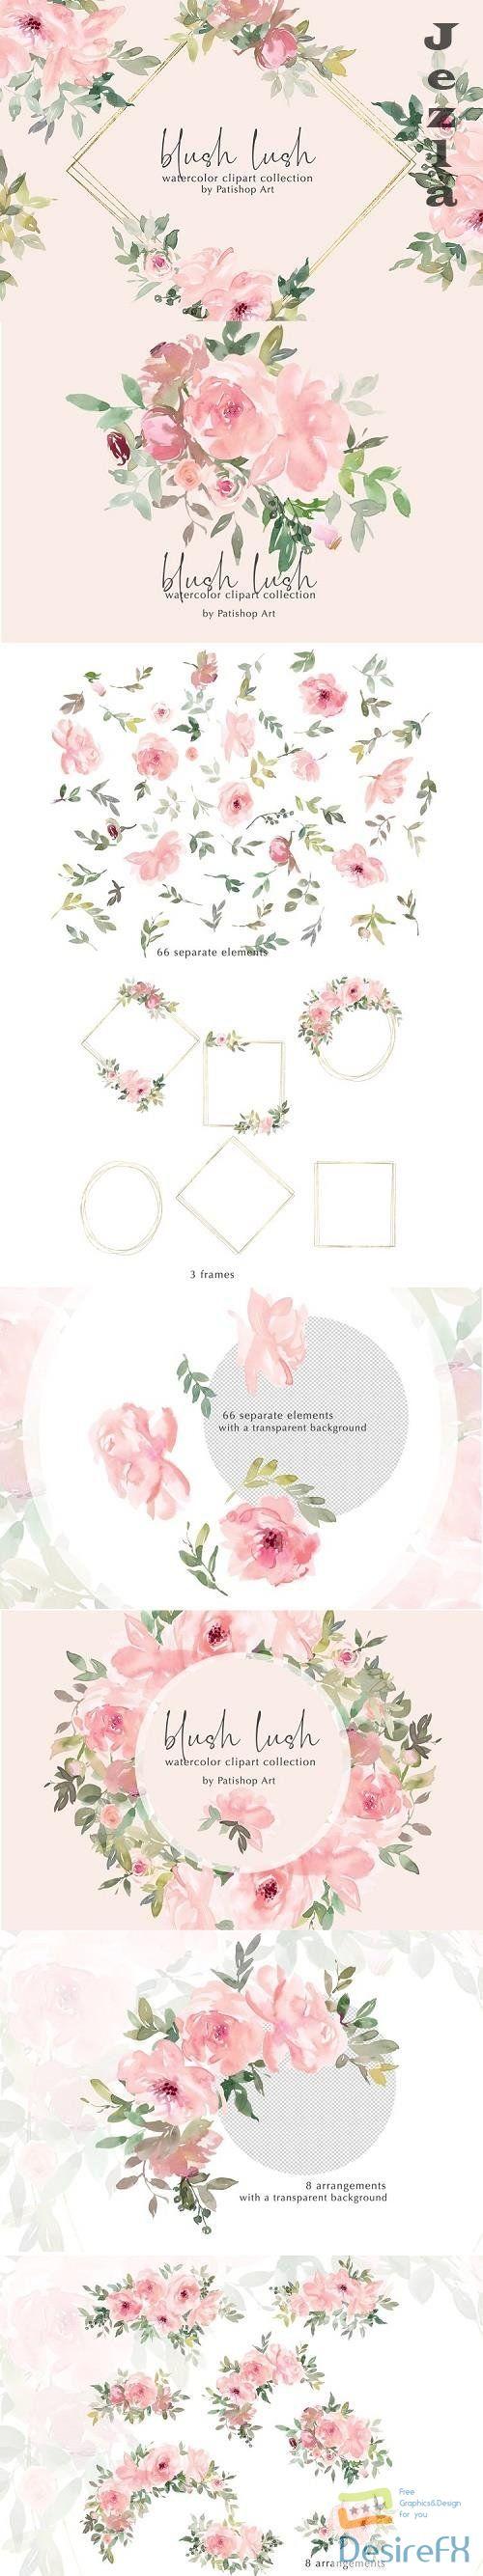 Blush Lush Watercolor Floral Clip Art Collection - 656617